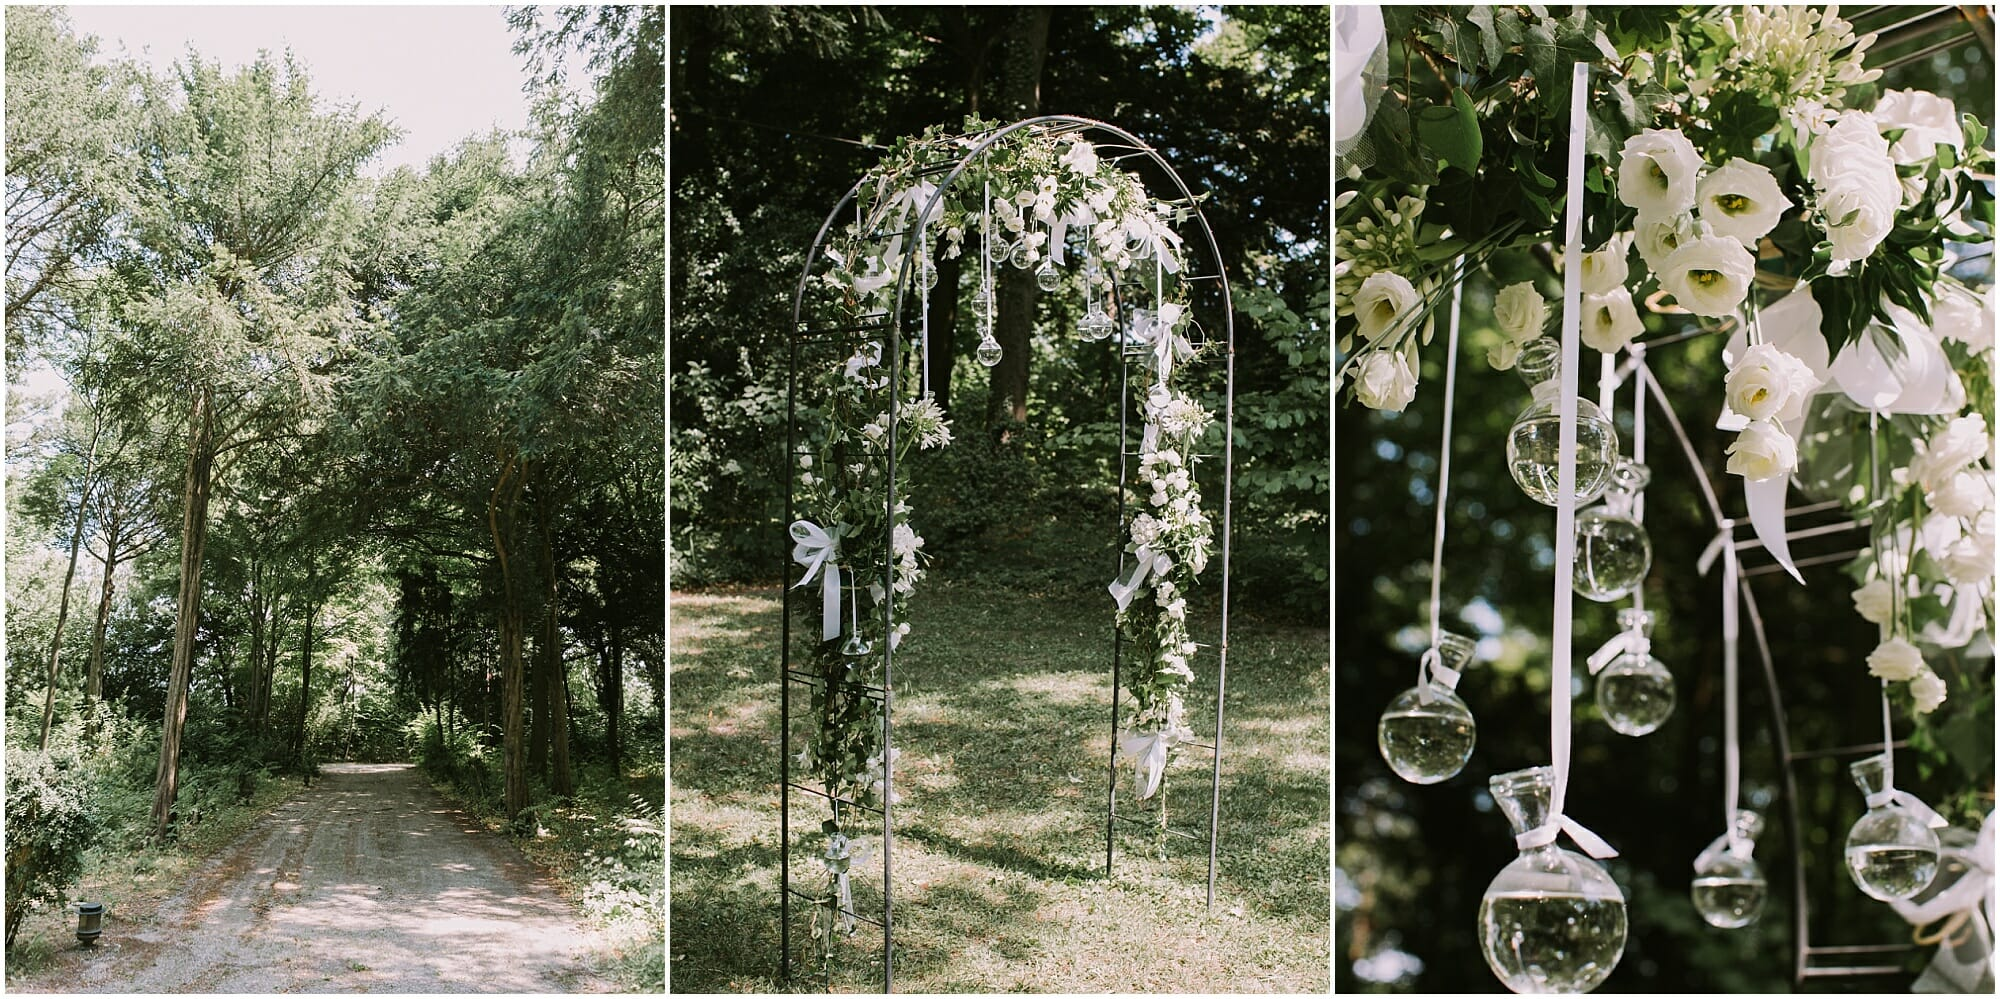 Kateryna-photos-photographe-mariage-chateau-des-3-fontaines-provence-avignon-vaucluse-sud_0015.jpg